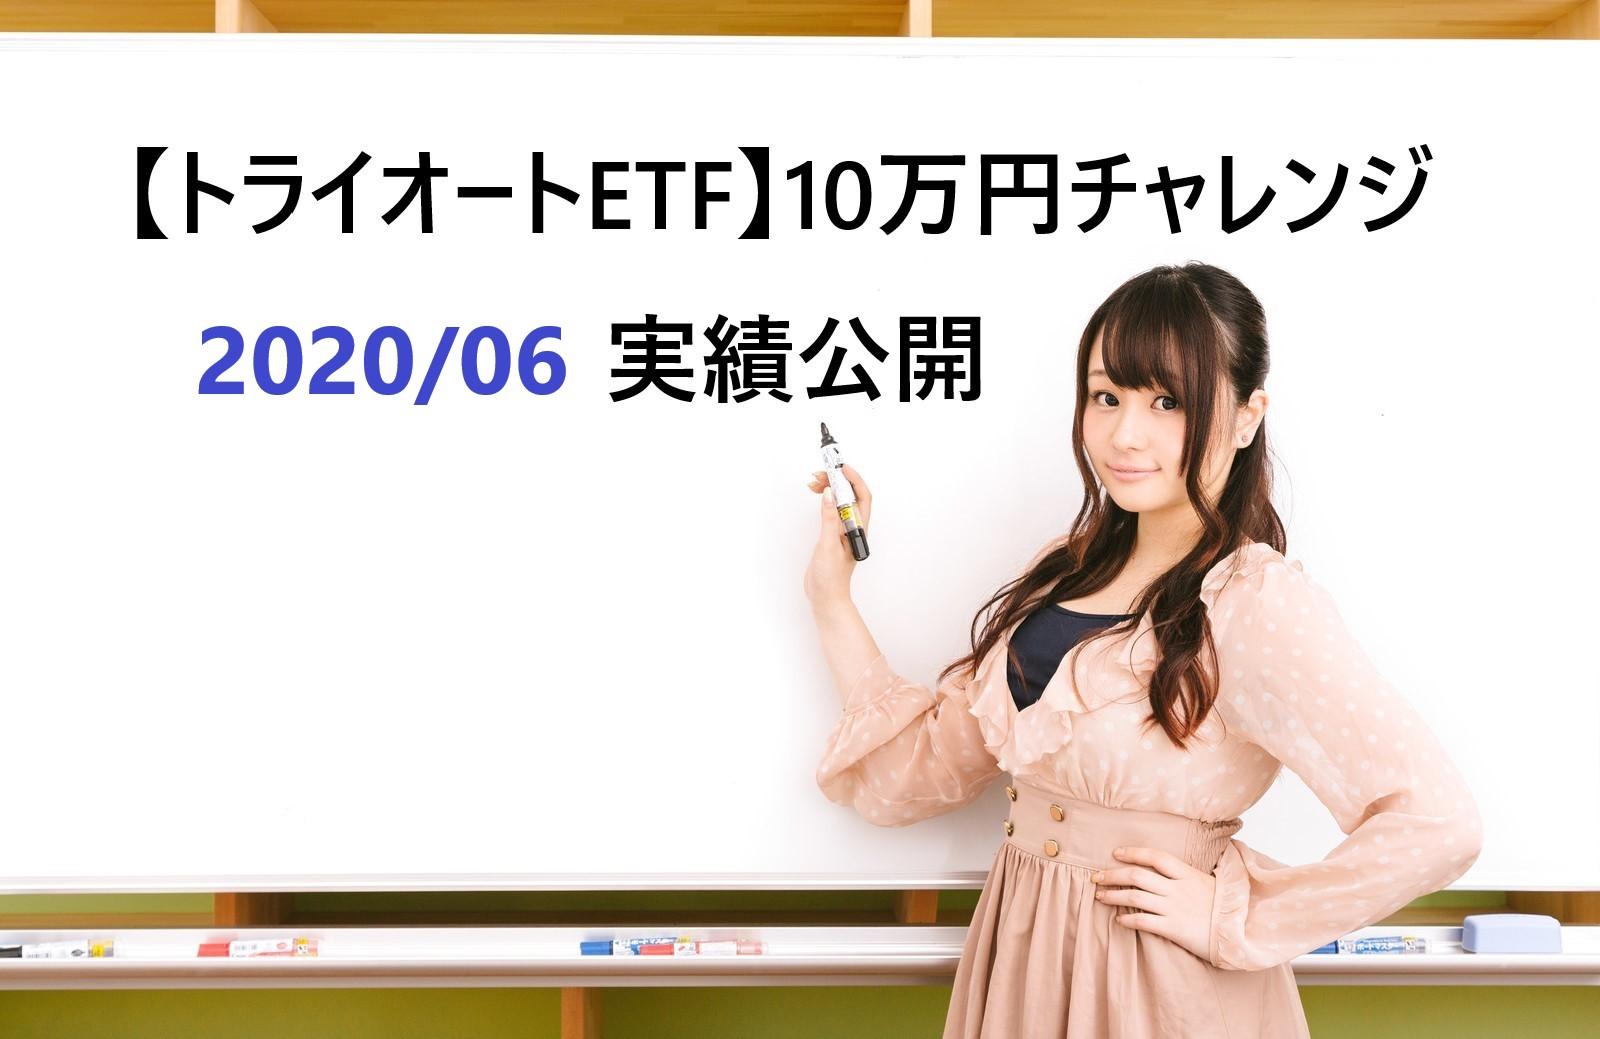 triauto-etf-challenge-202006